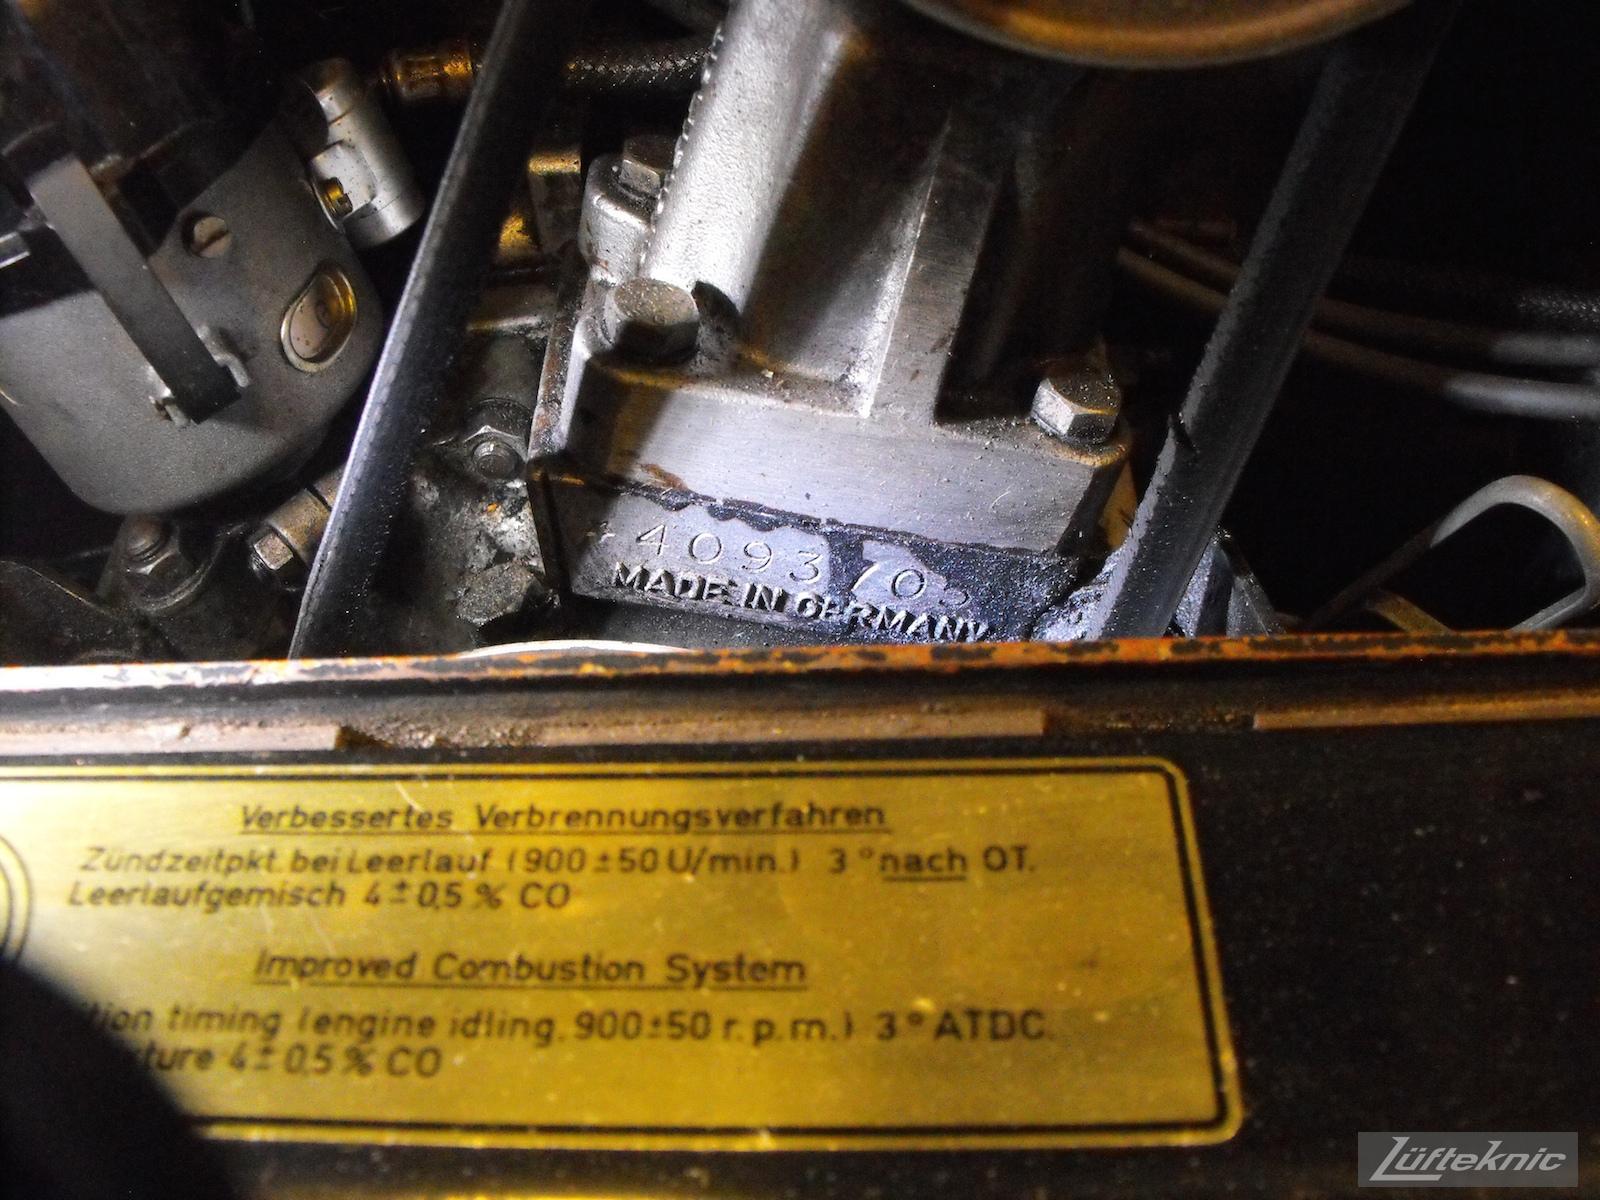 Close up of an engine serial number of an Irish Green Porsche 912 undergoing restoration at Lufteknic.